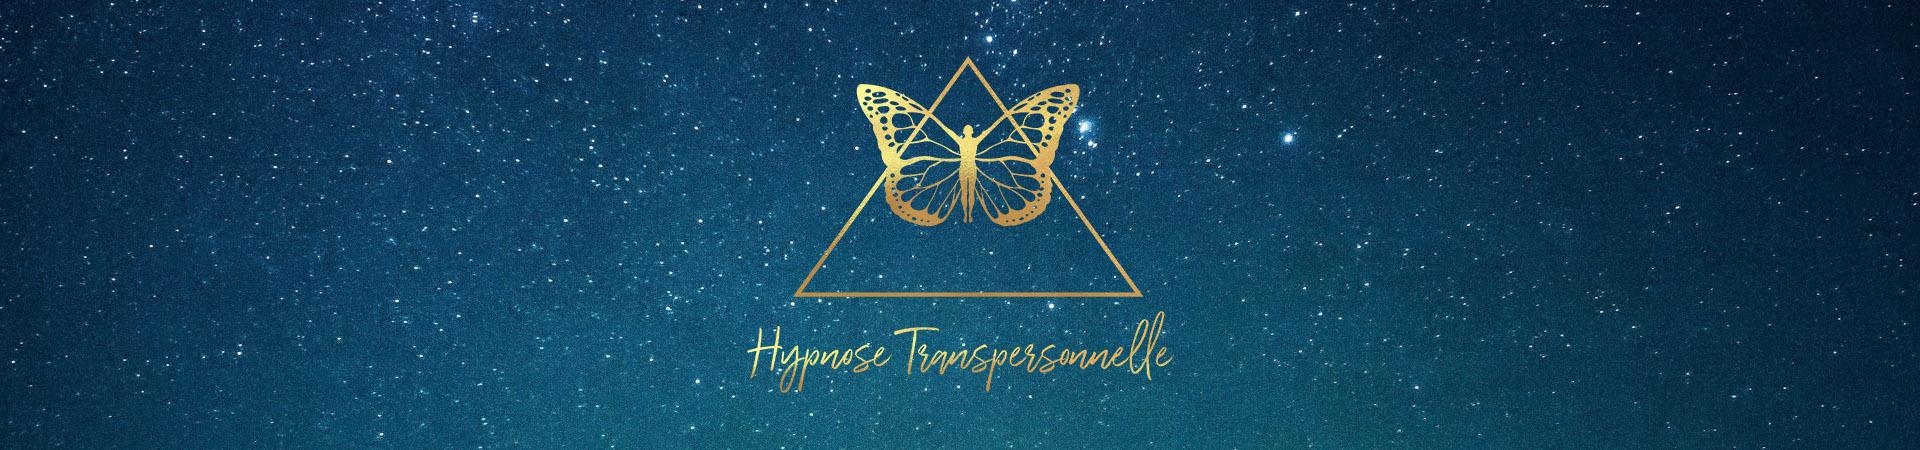 Nébuleuse Hypnose Transpersonnelle